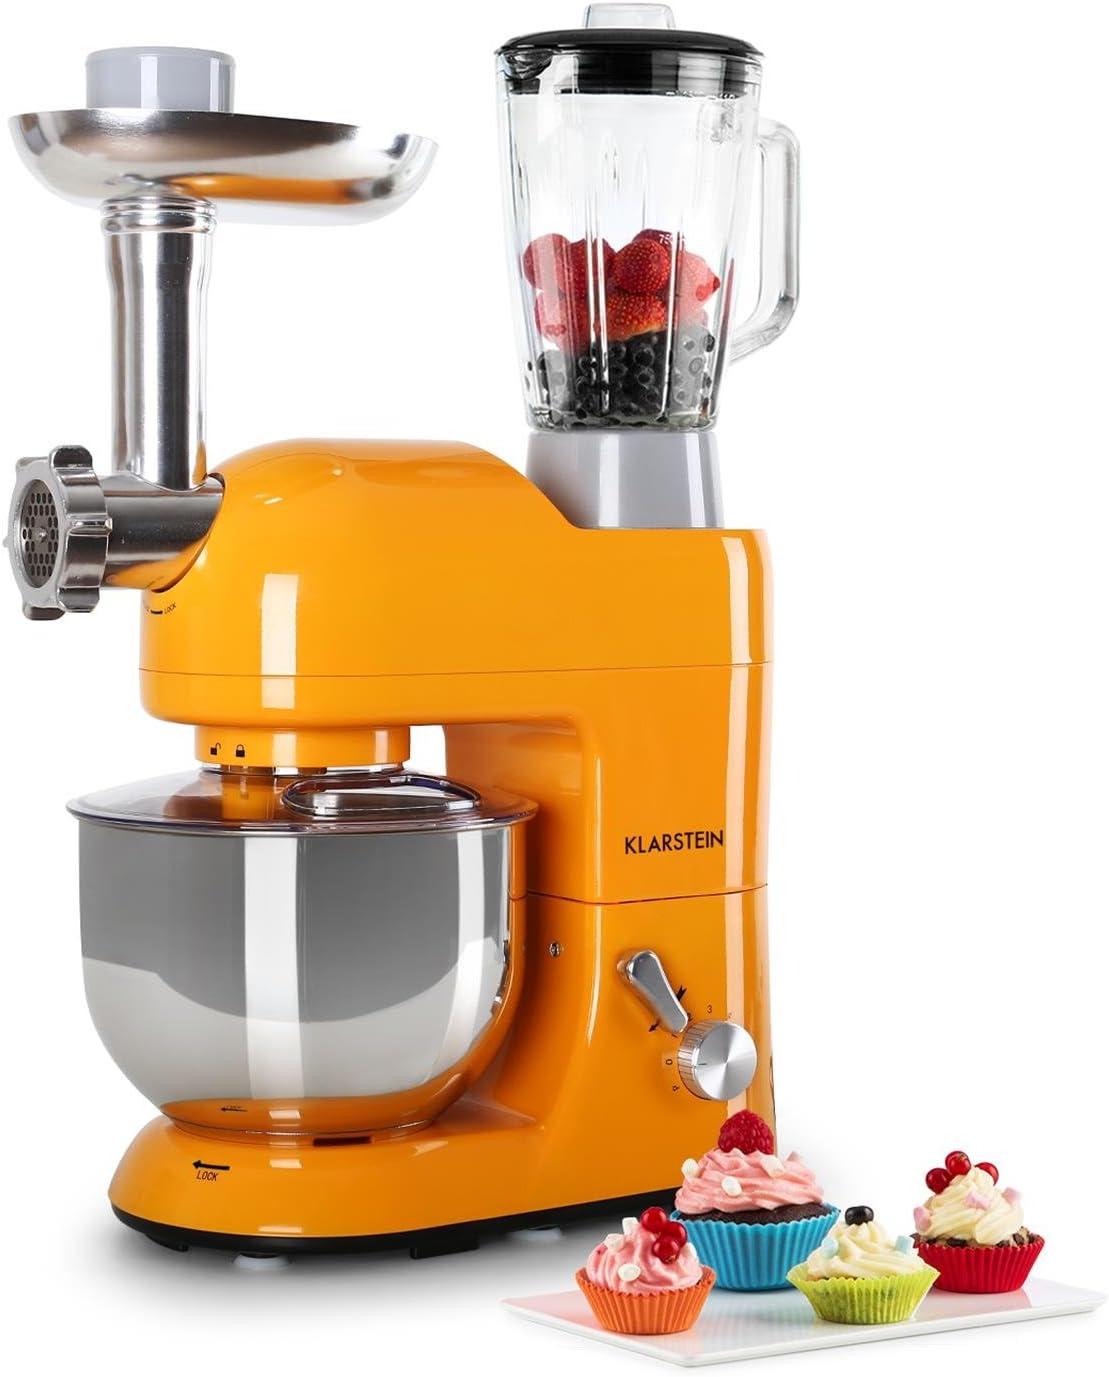 Klarstein Lucia Orangina - Robot de Cocina Universal, Batidora ...